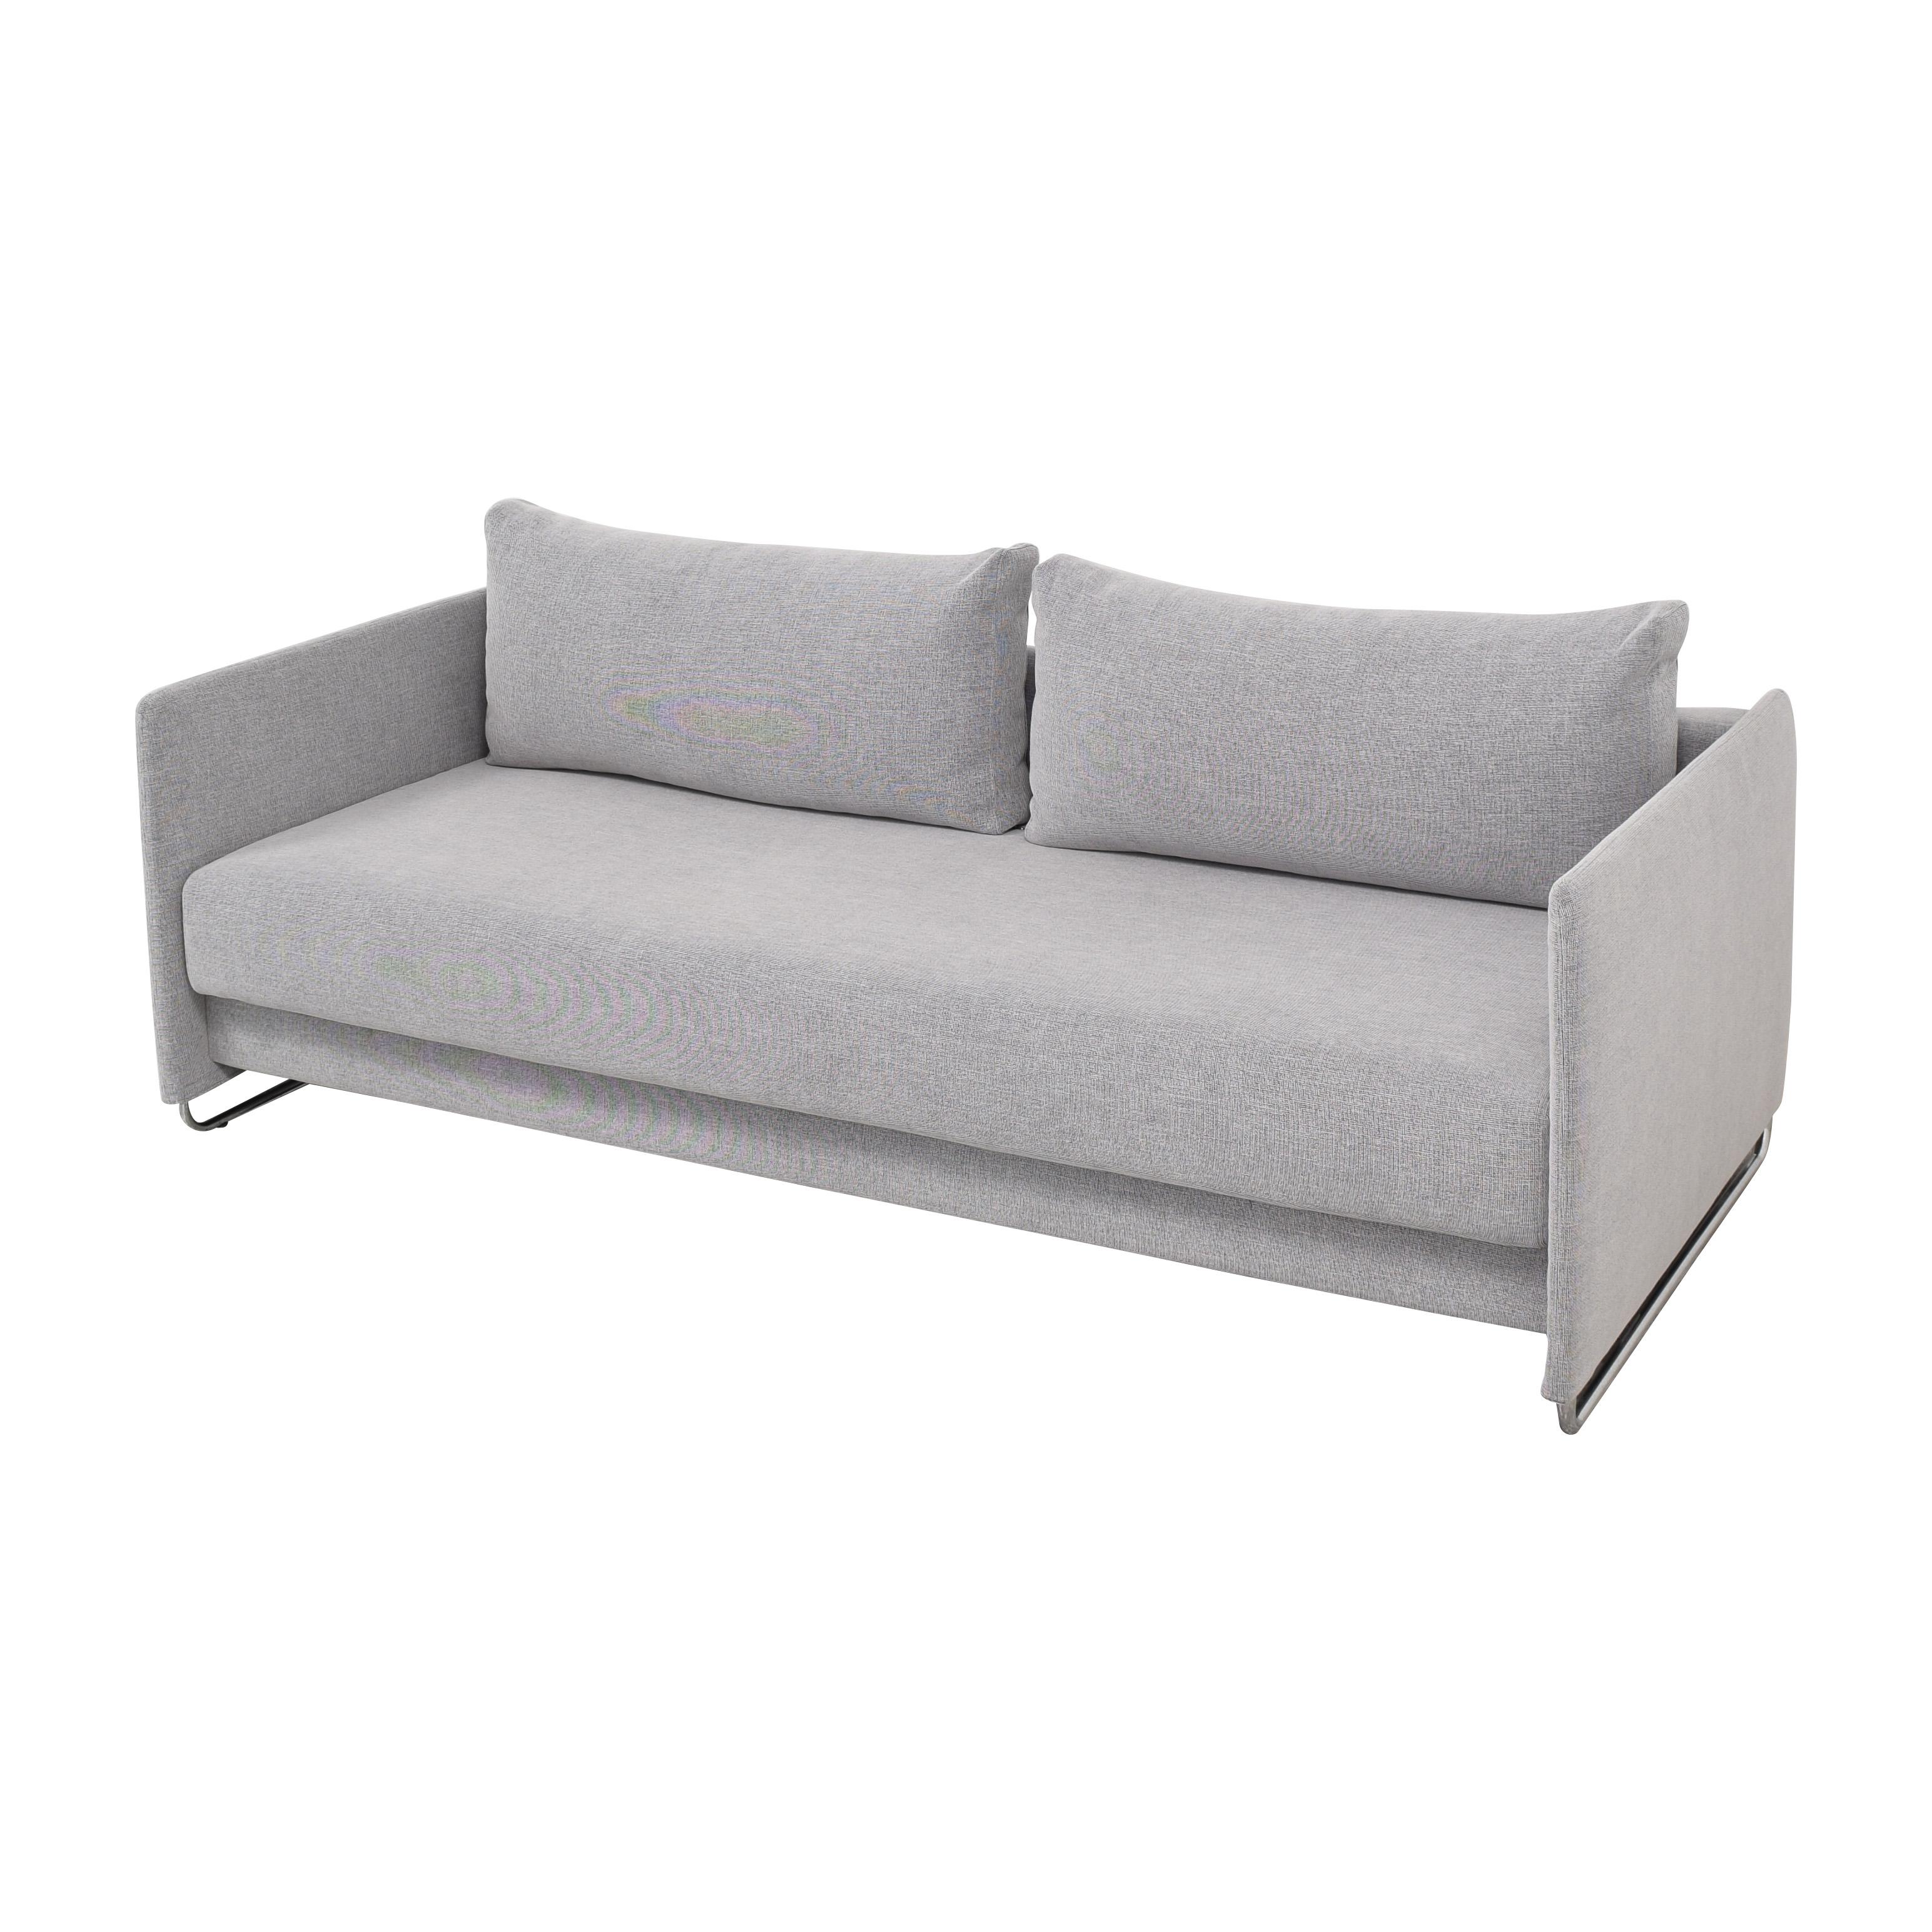 21 OFF   CB2 CB2 Tandom Microgrid Grey Sleeper Sofa / Sofas